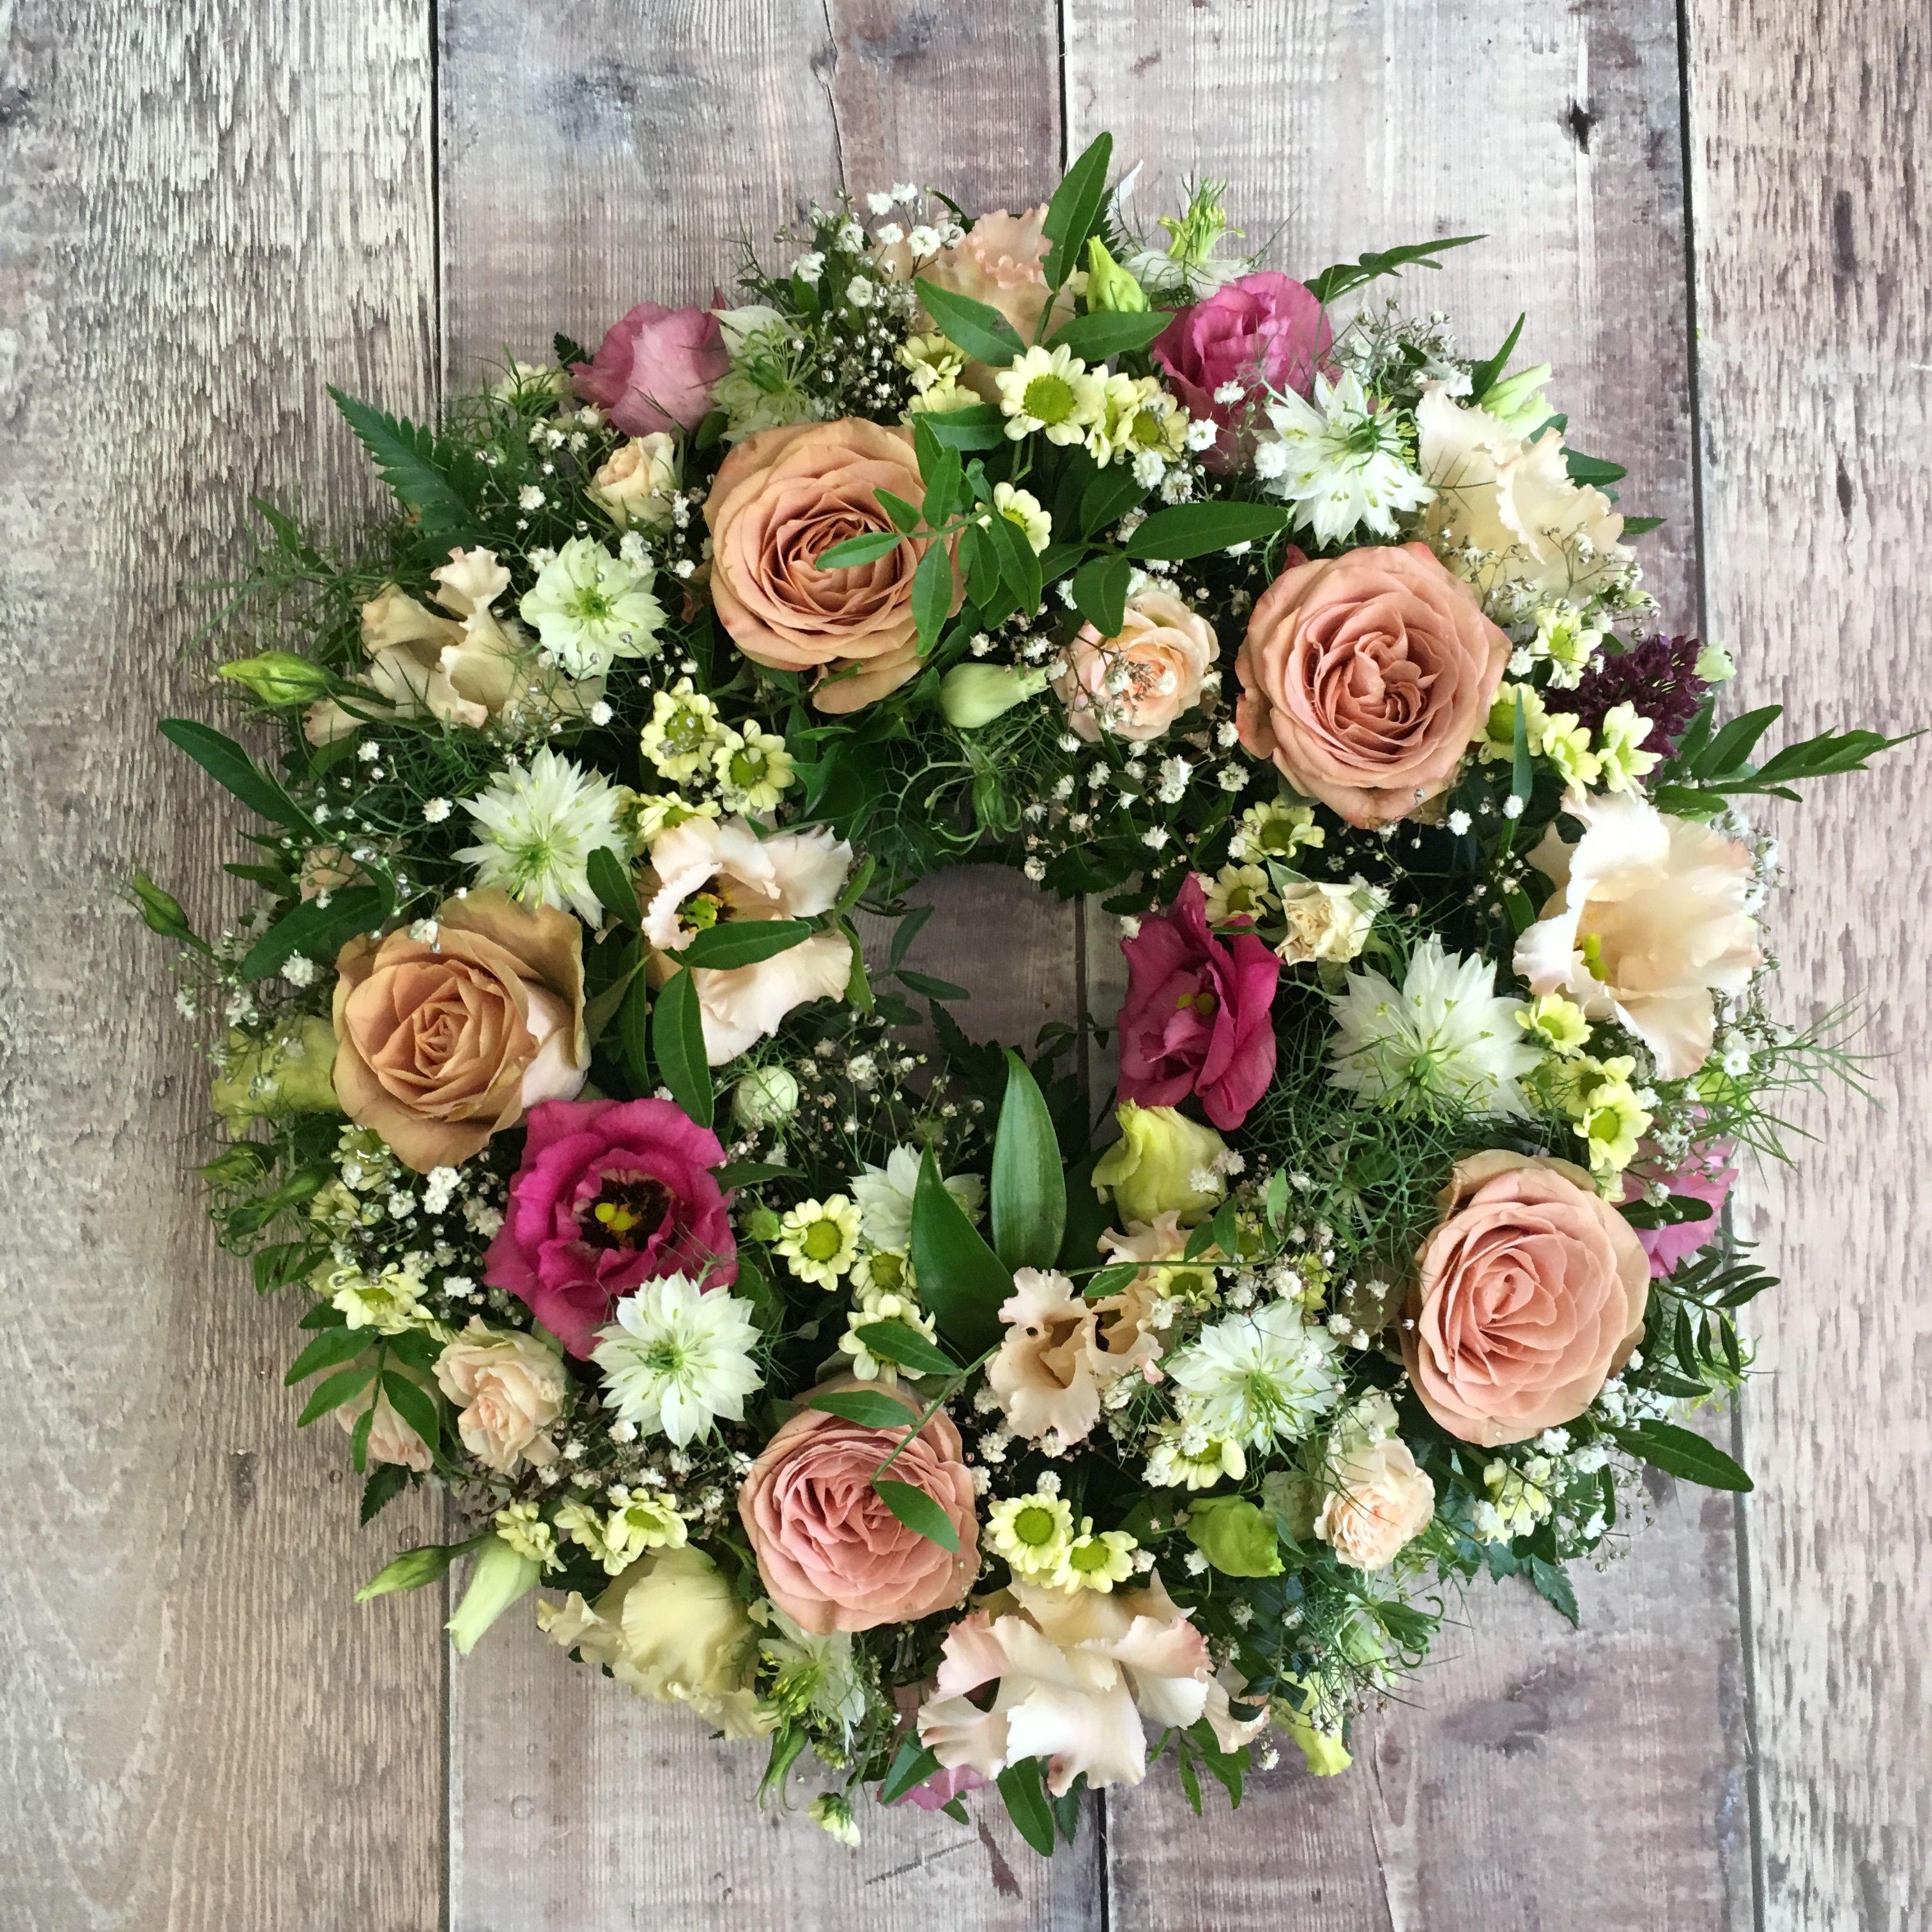 Wild Look Rose Wreath Ammiflowersdevizes Funeralflowers Wreath